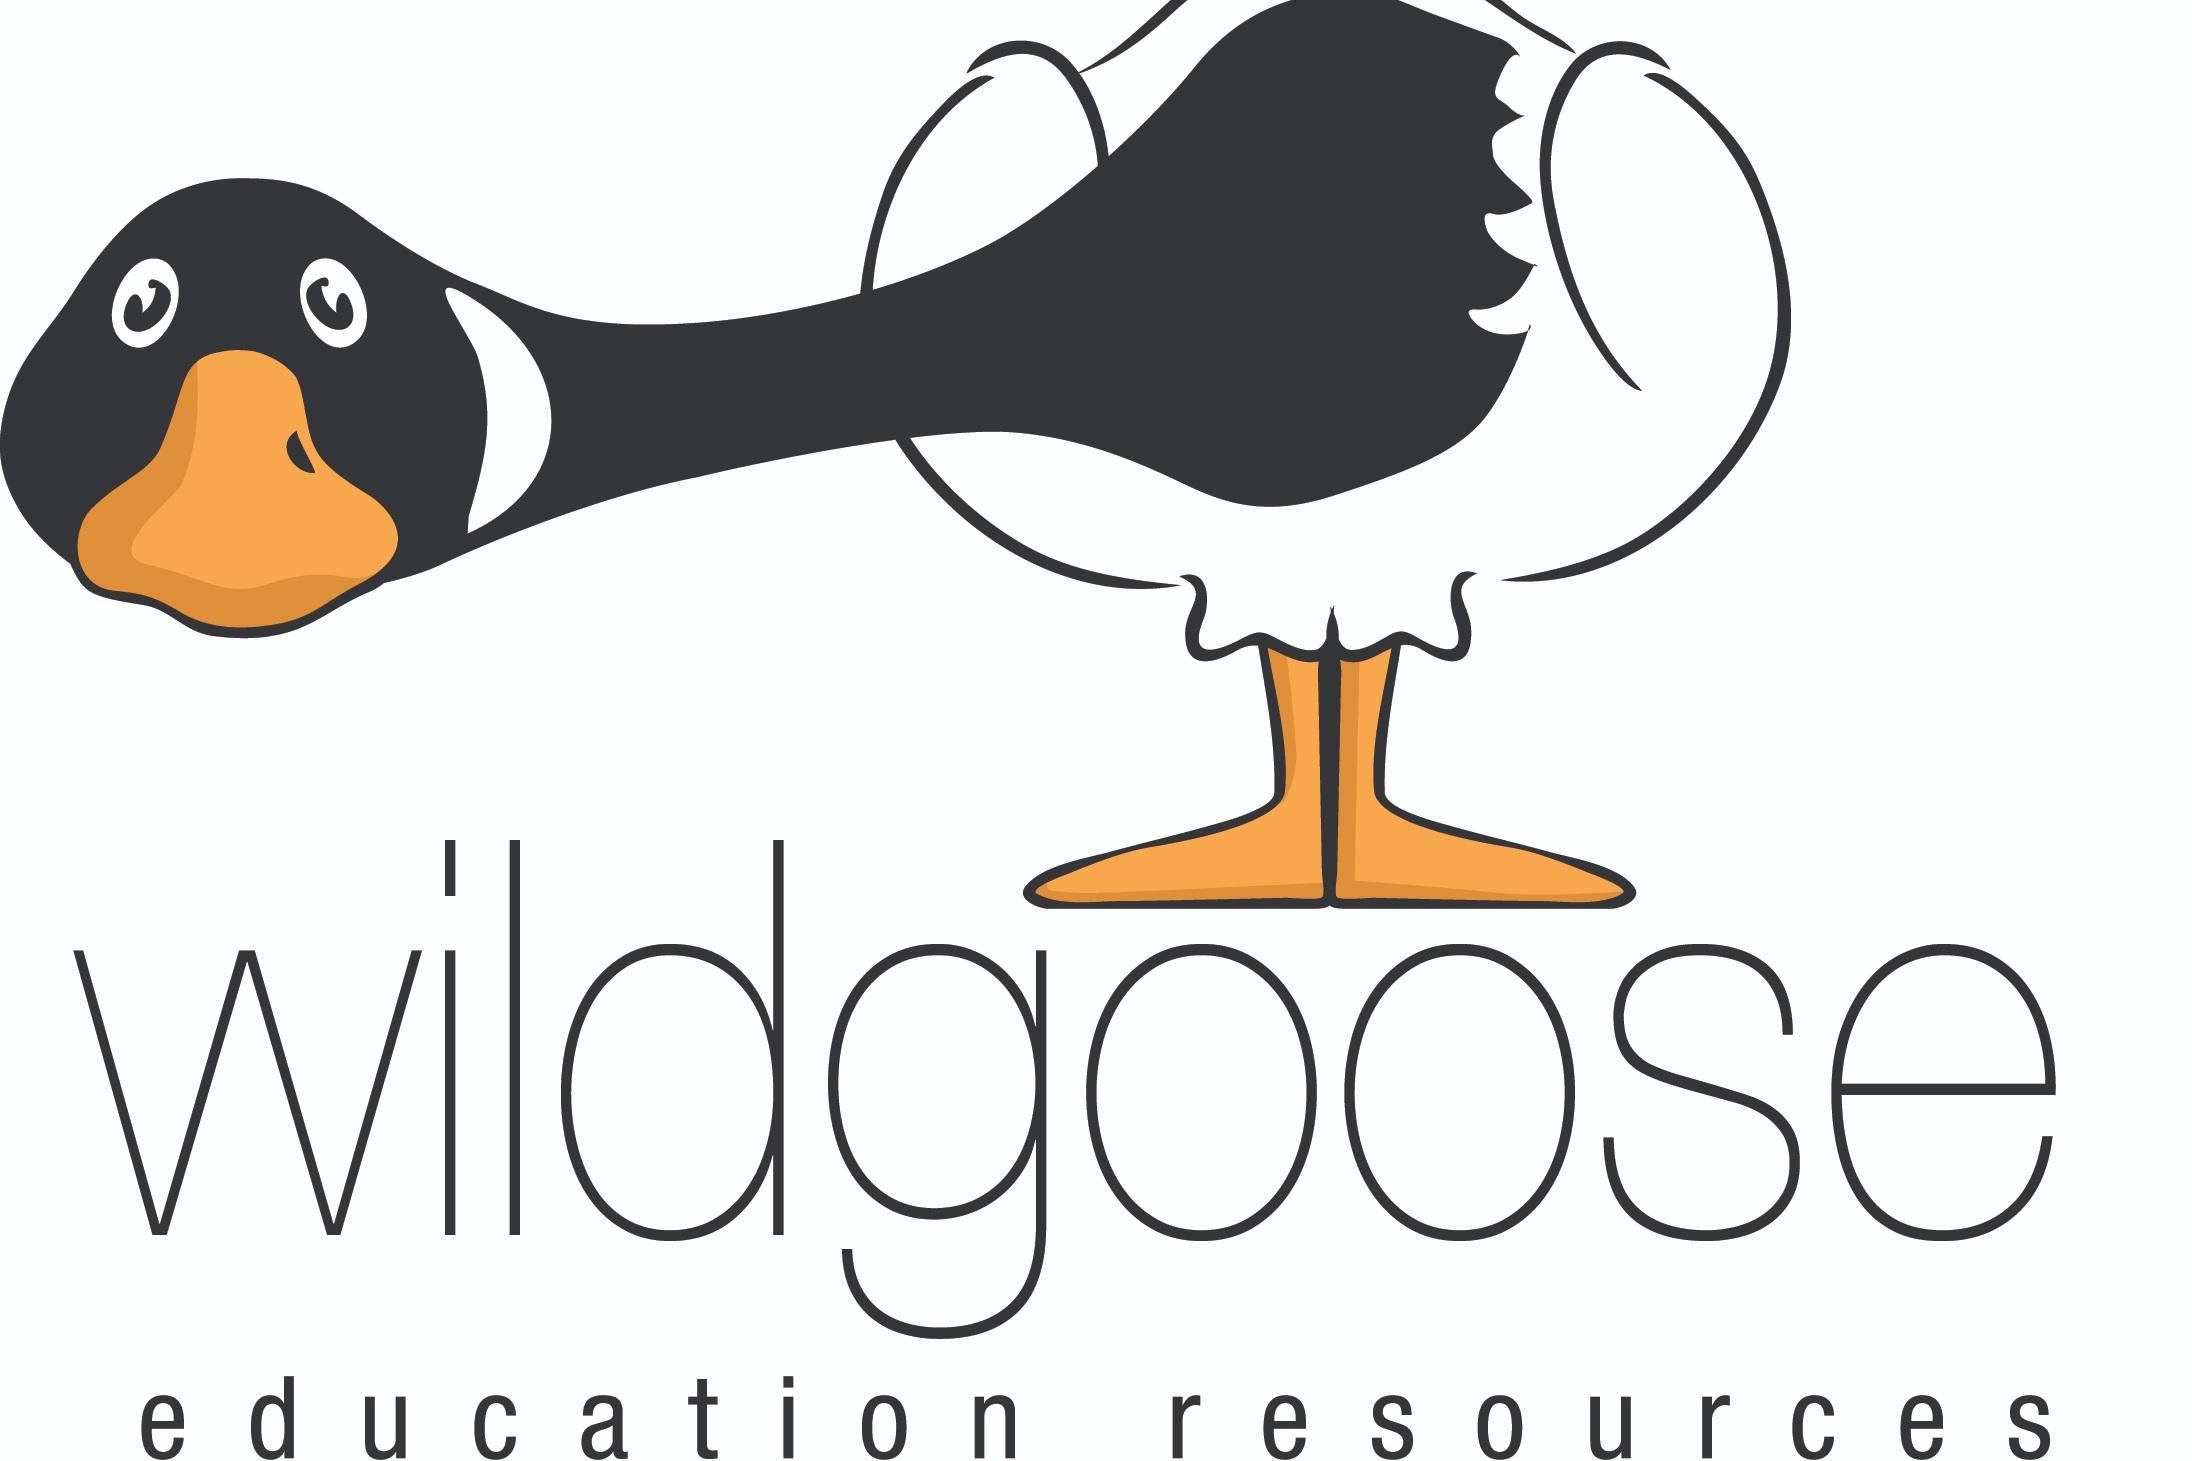 Wildgoose+Logo+Strap+Line.jpg